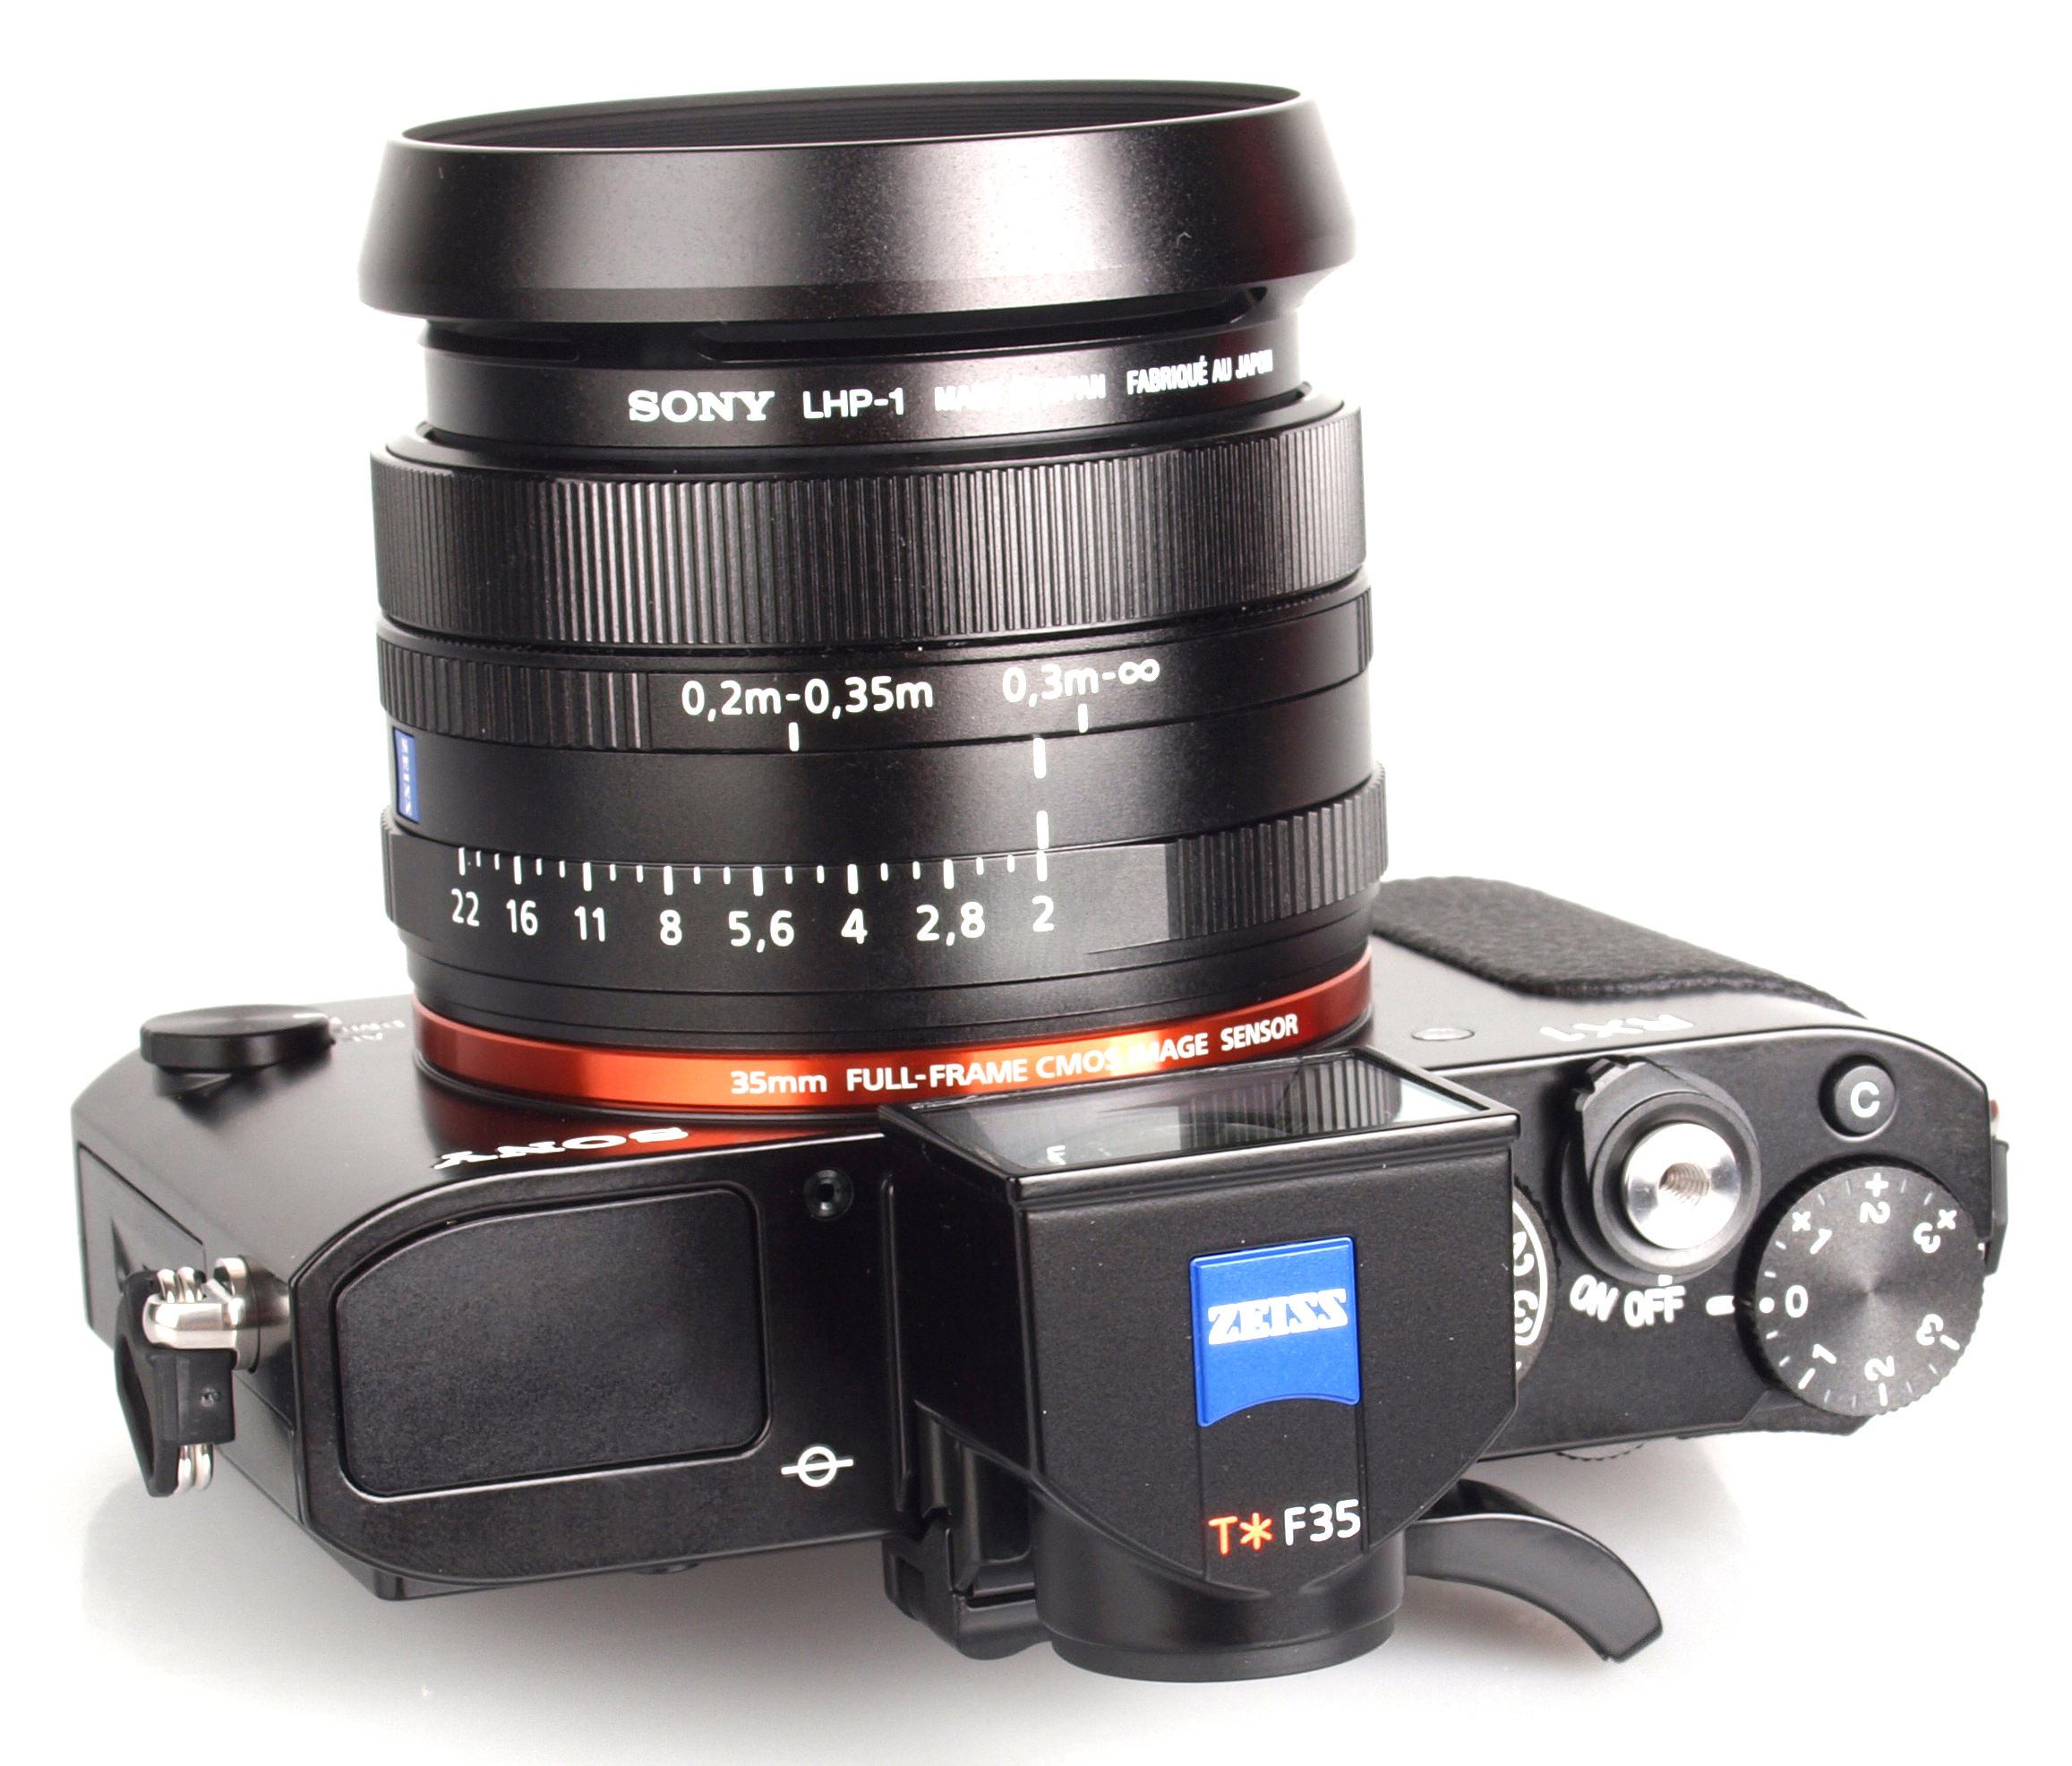 Sony Cyber-shot RX1 Sample Photos